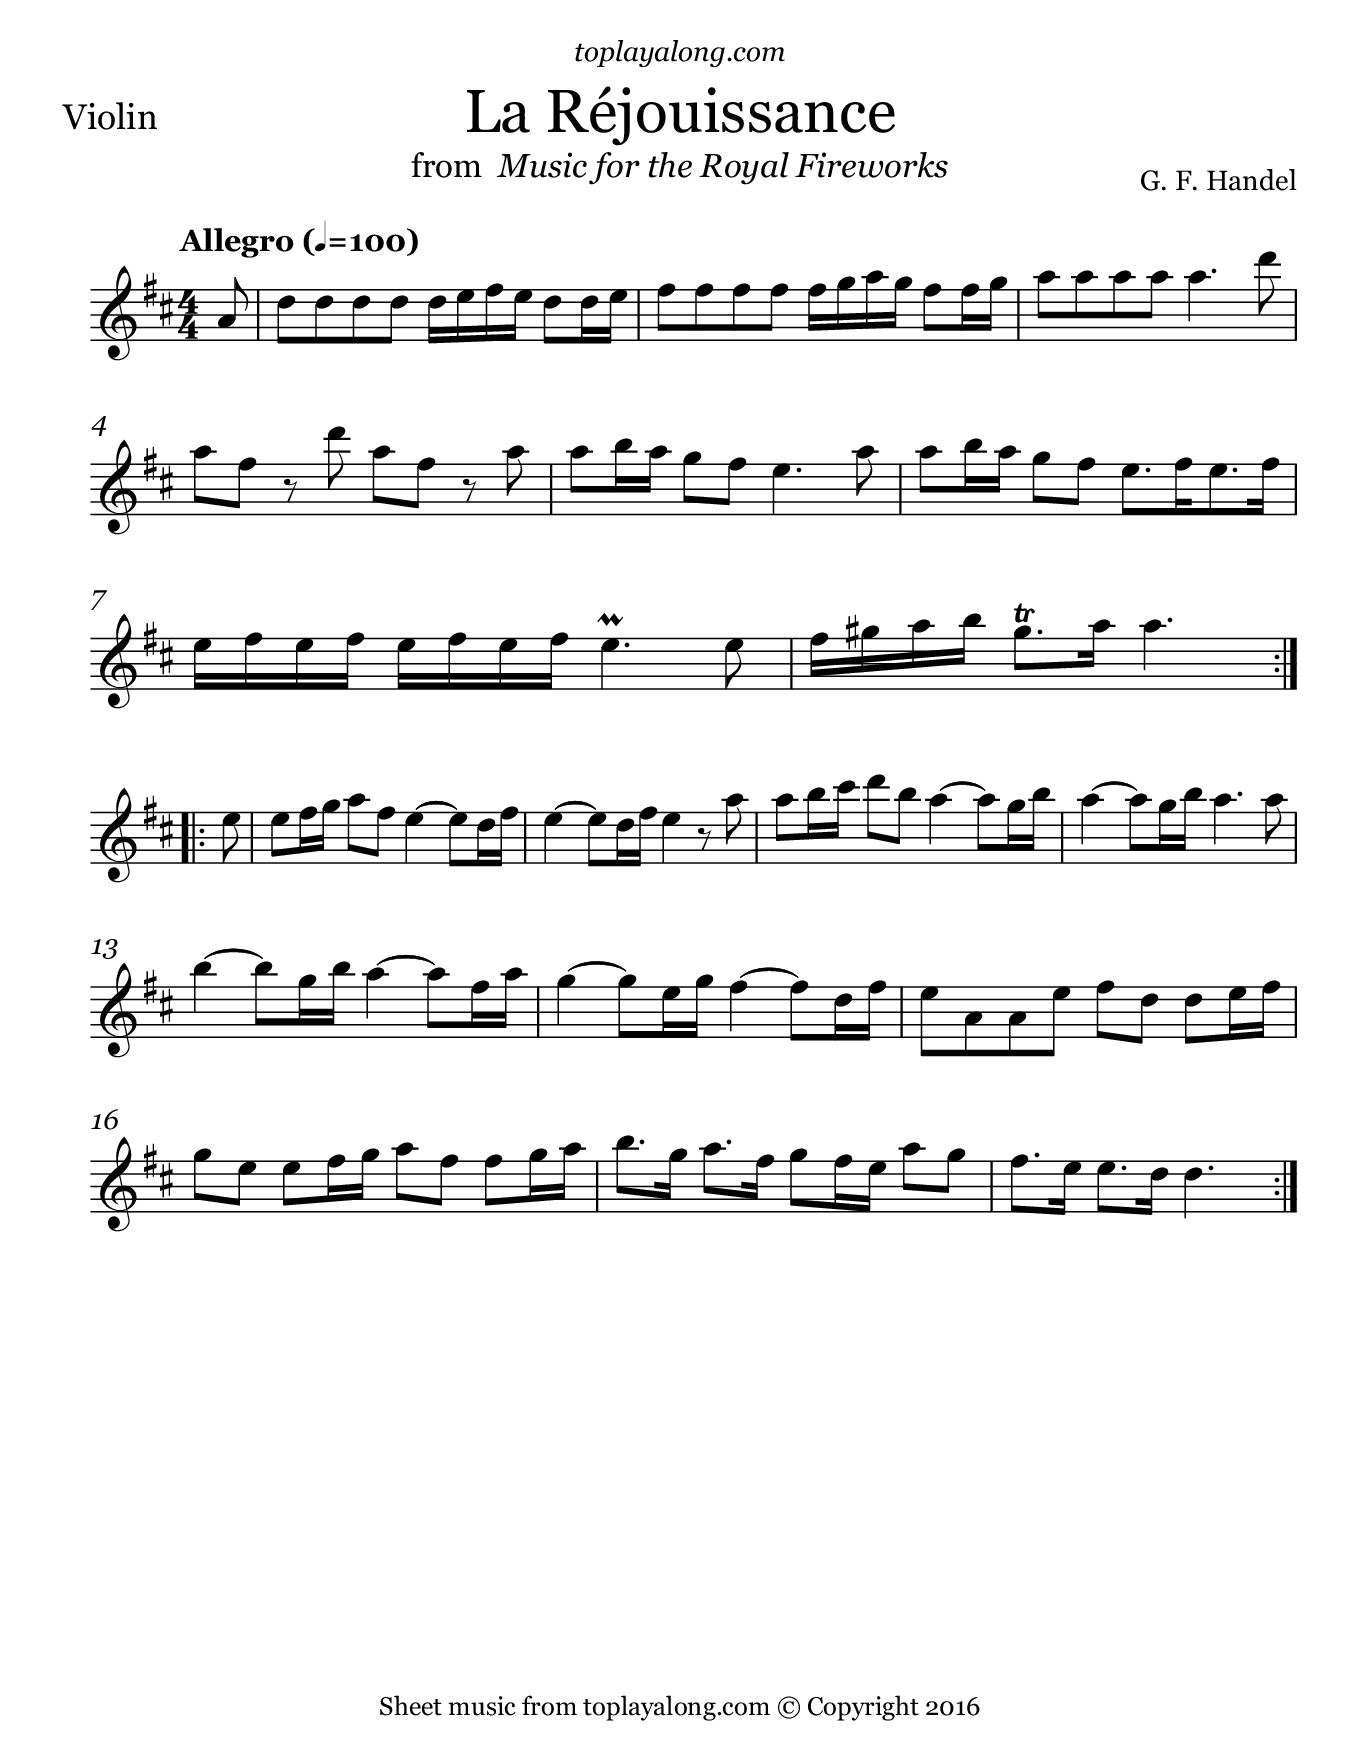 La Rejouissance From Royal Fireworks By Handel Free Sheet